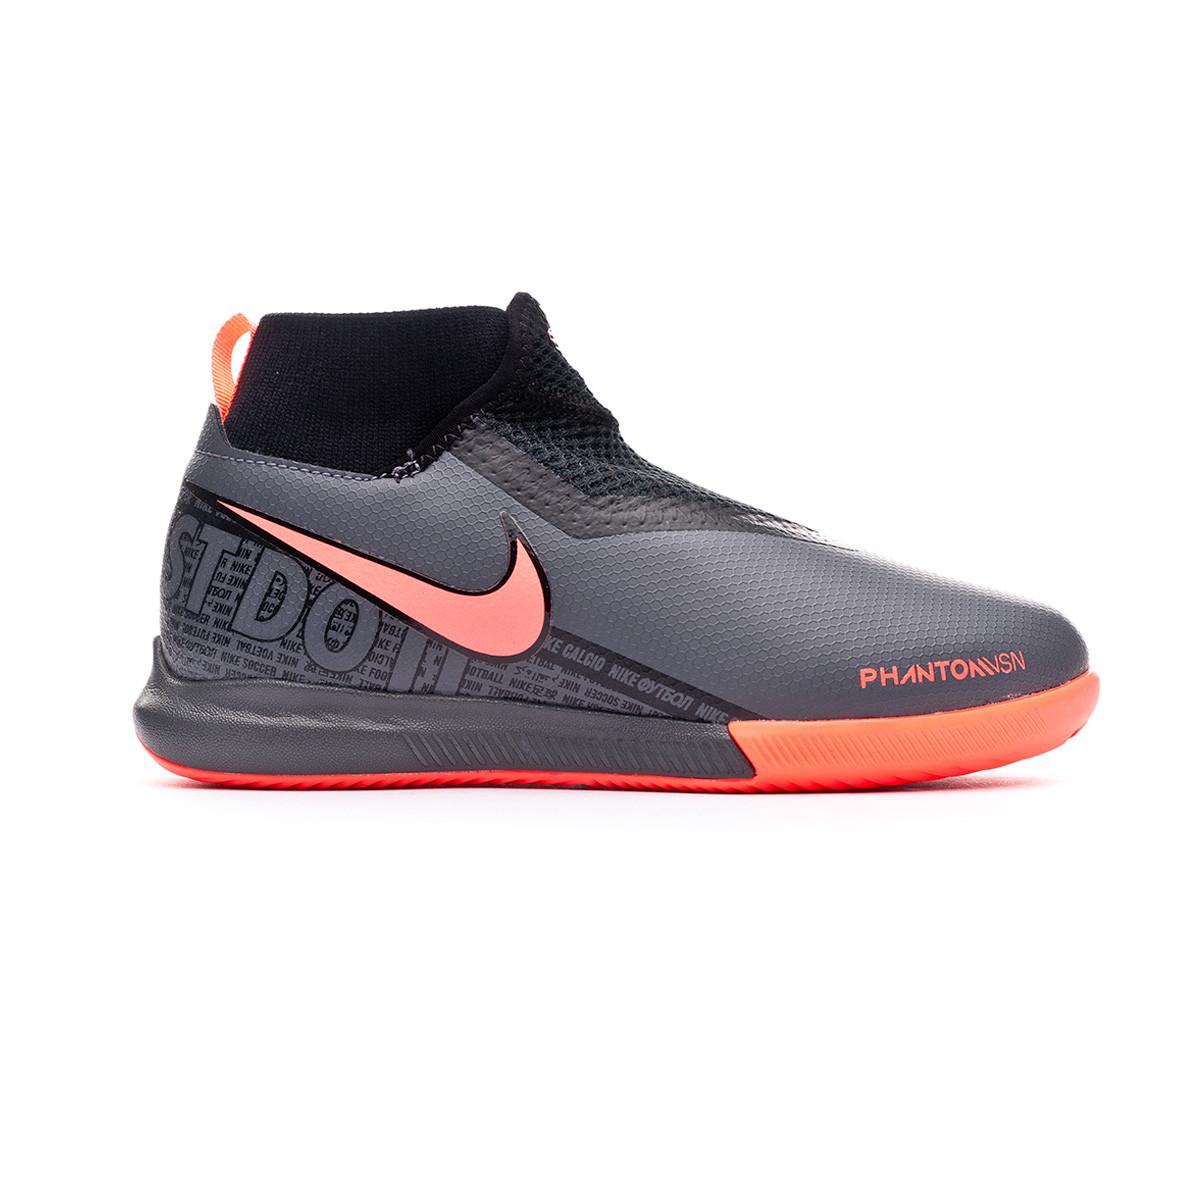 Sapatilha de Futsal Nike Phantom Vision Academy DF IC